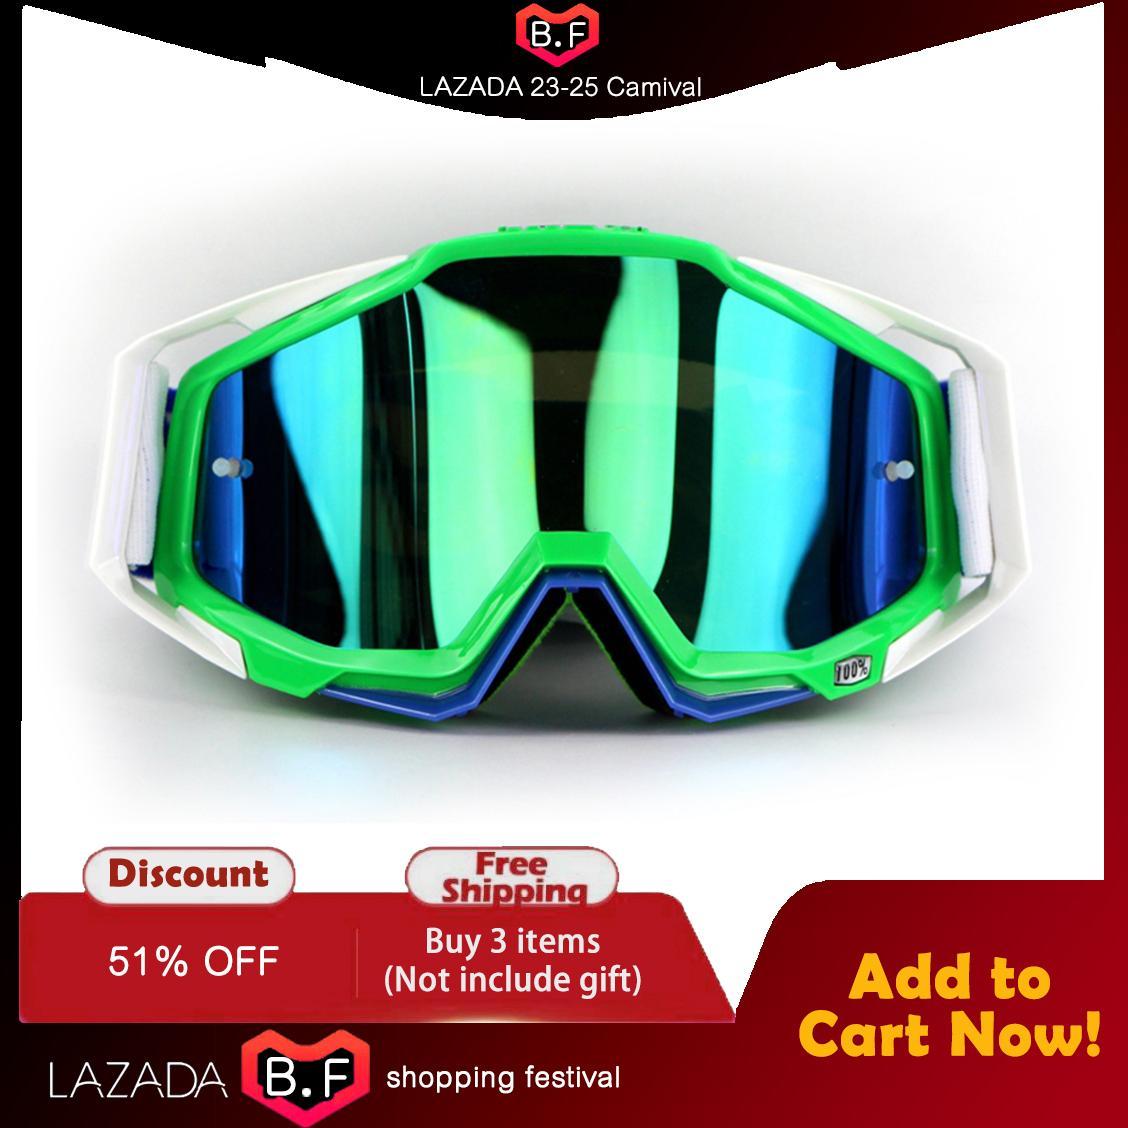 5 Warna 100% Brand Racecraft Motocross Kacamata Goggles ATV Motorcycle Gafas YH06-Intl